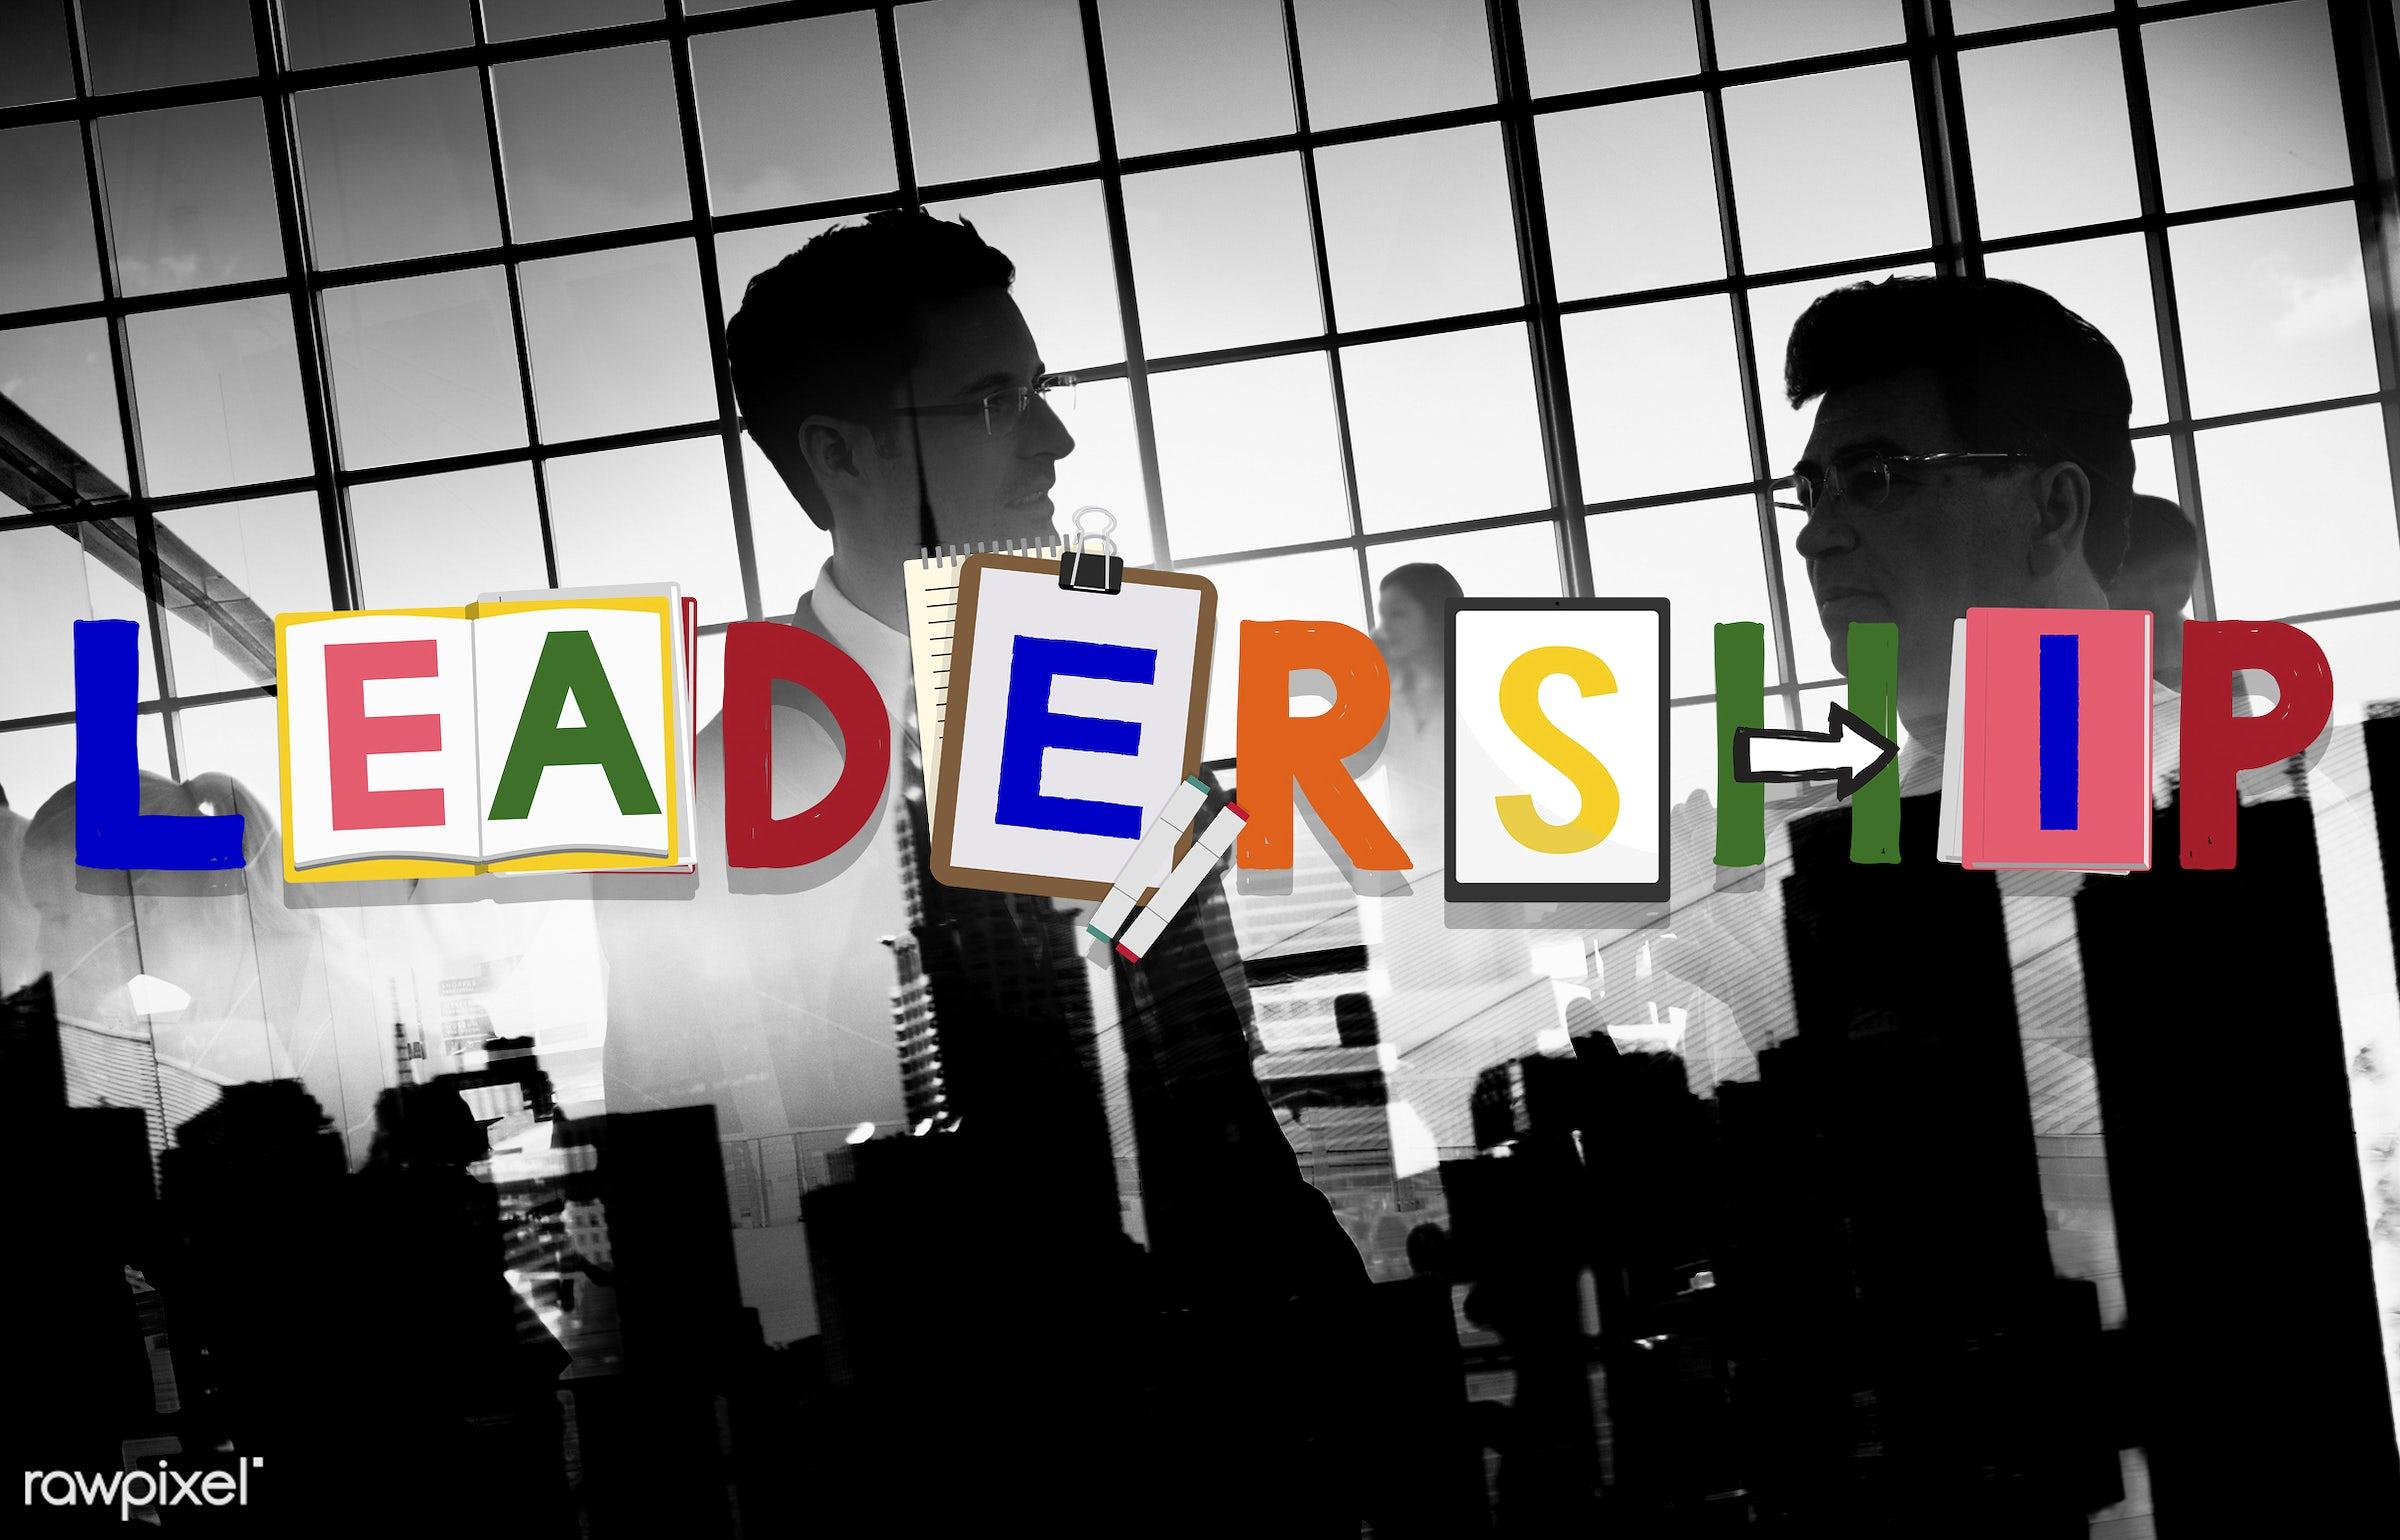 adviser, authority, board room, boss, brainstorming, building, business, business people, businessmen, businesswomen,...